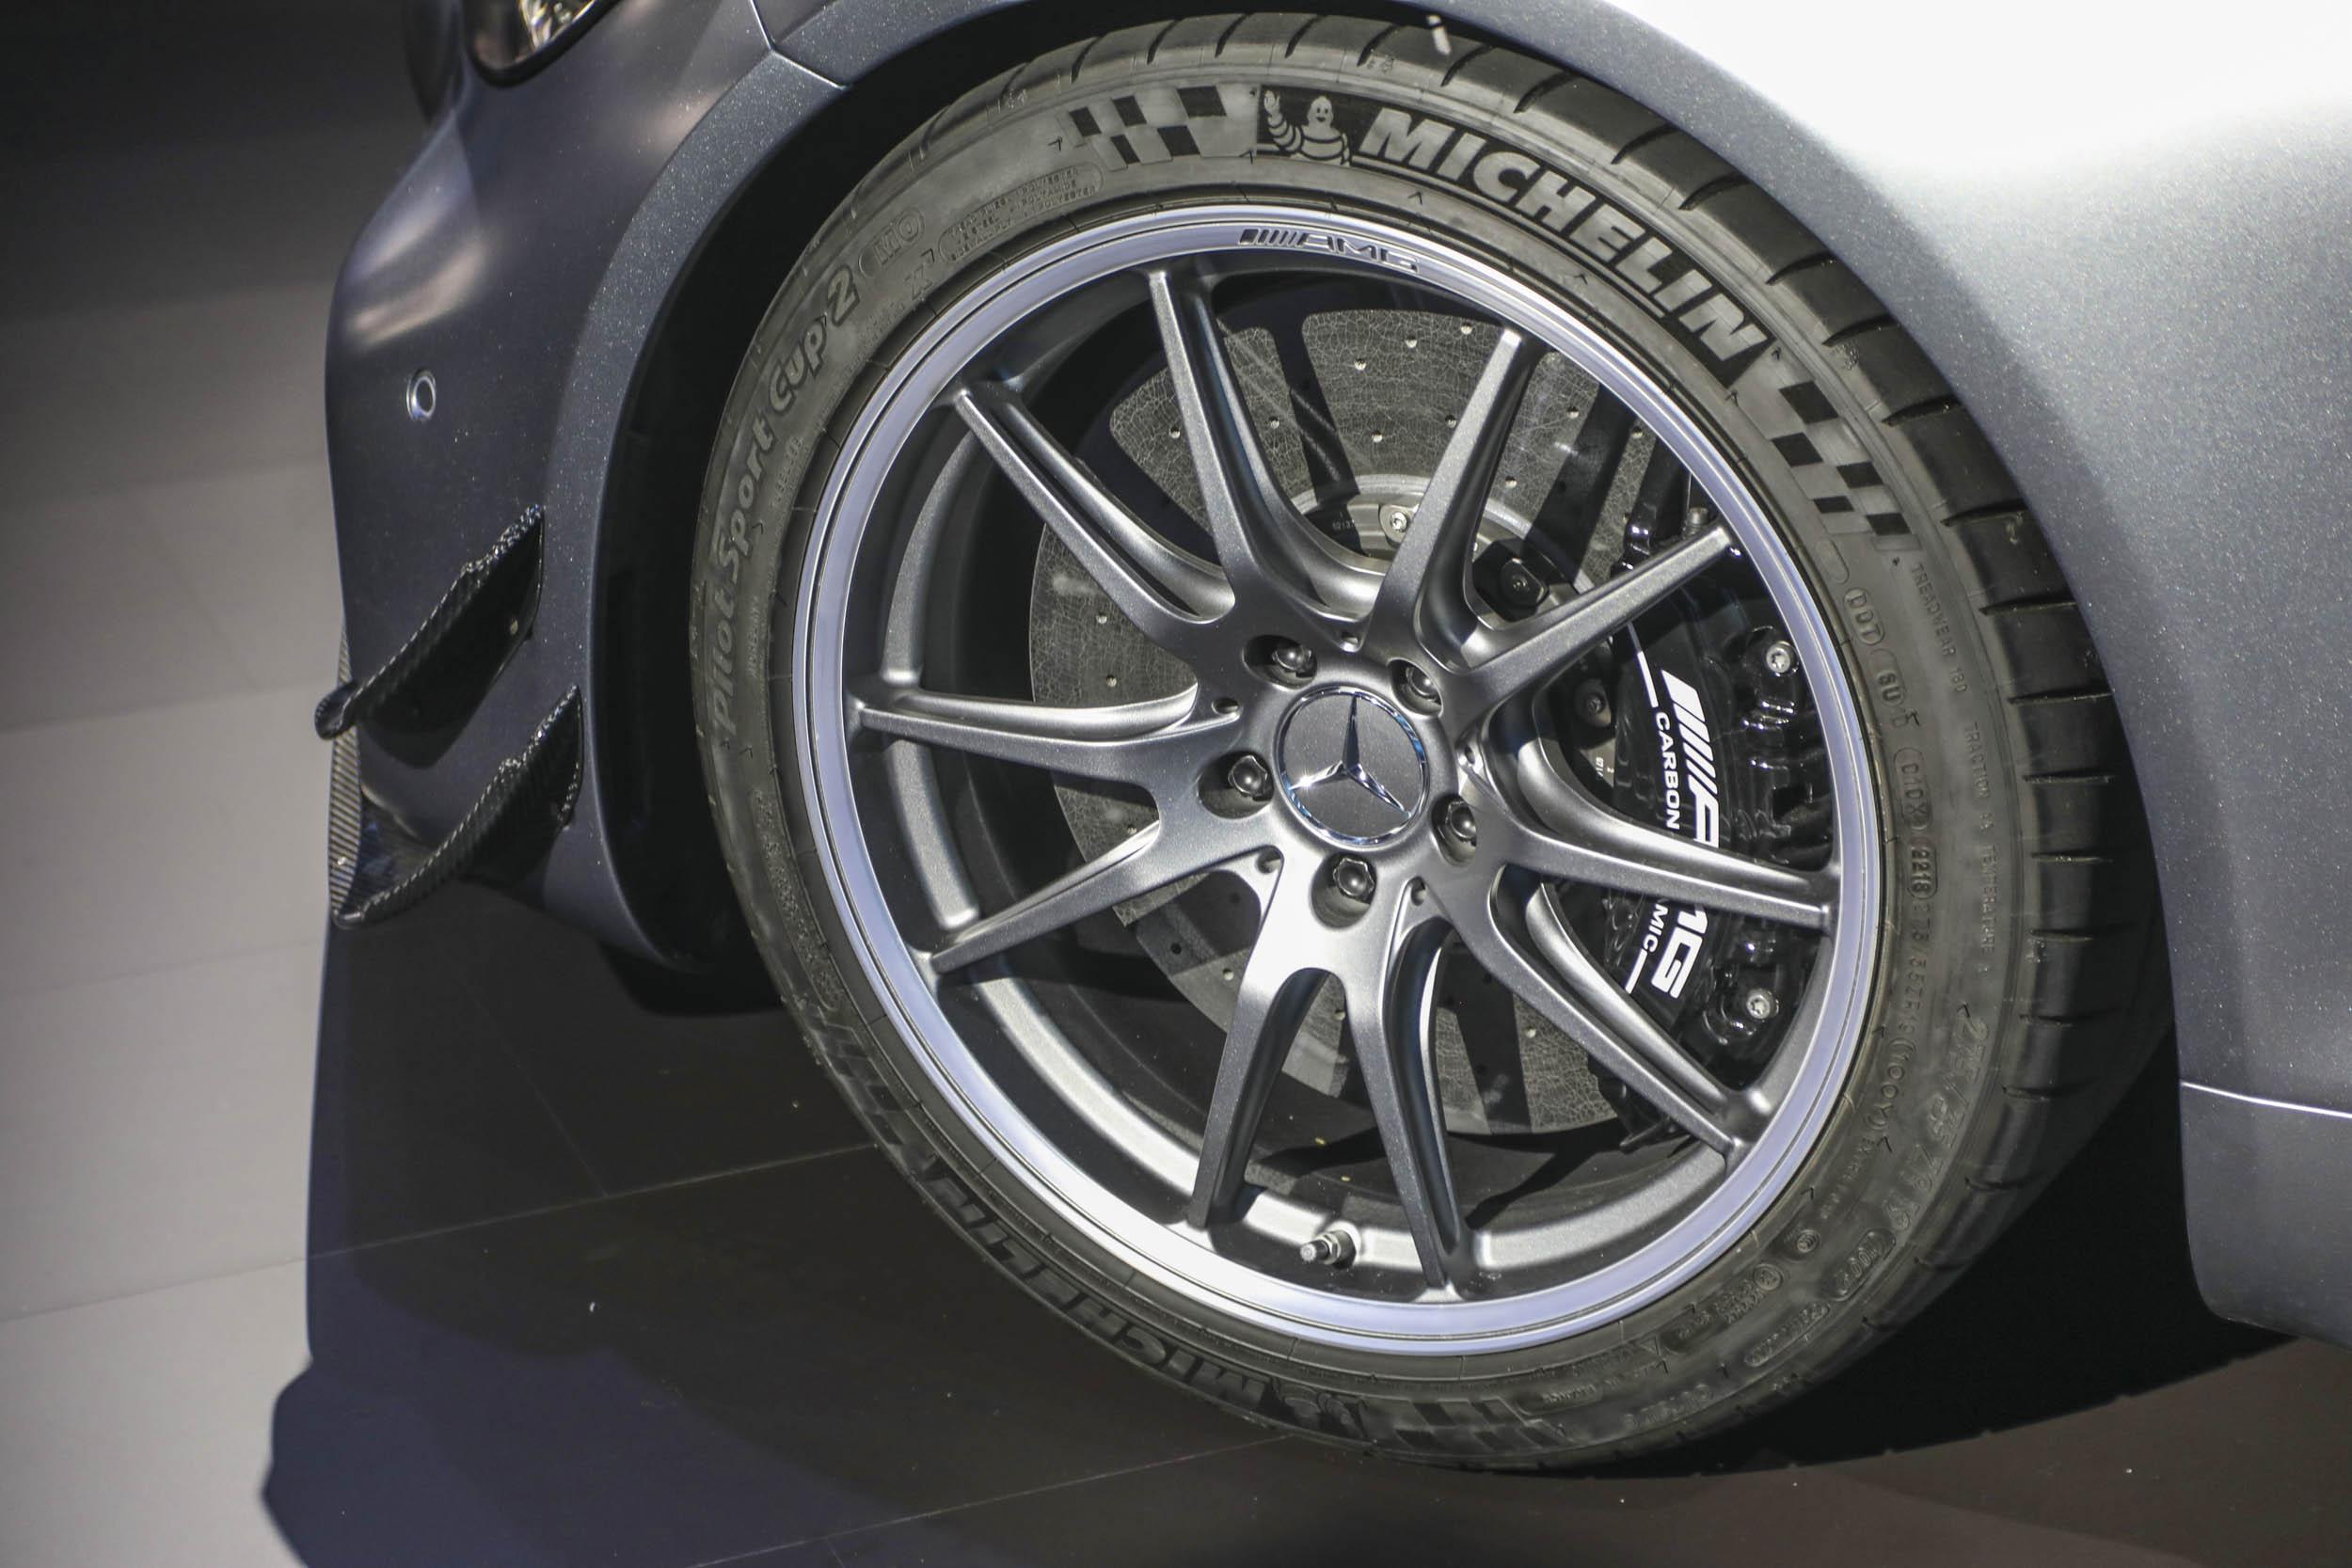 Mercedes-AMG GT R Pro ceramic brakes